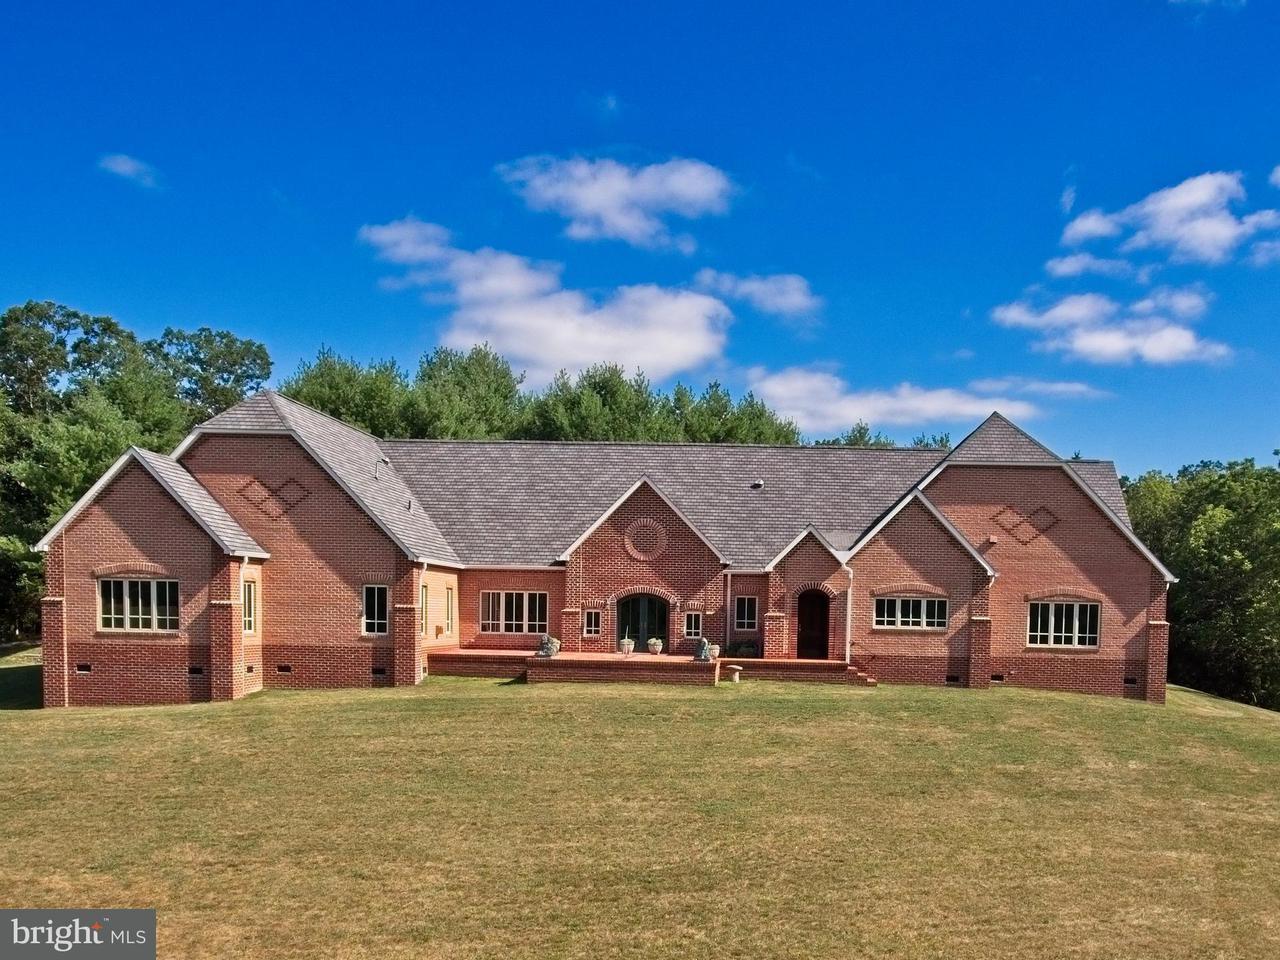 Single Family Home for Sale at 99 BLACKHAWK Lane 99 BLACKHAWK Lane Fort Valley, Virginia 22652 United States